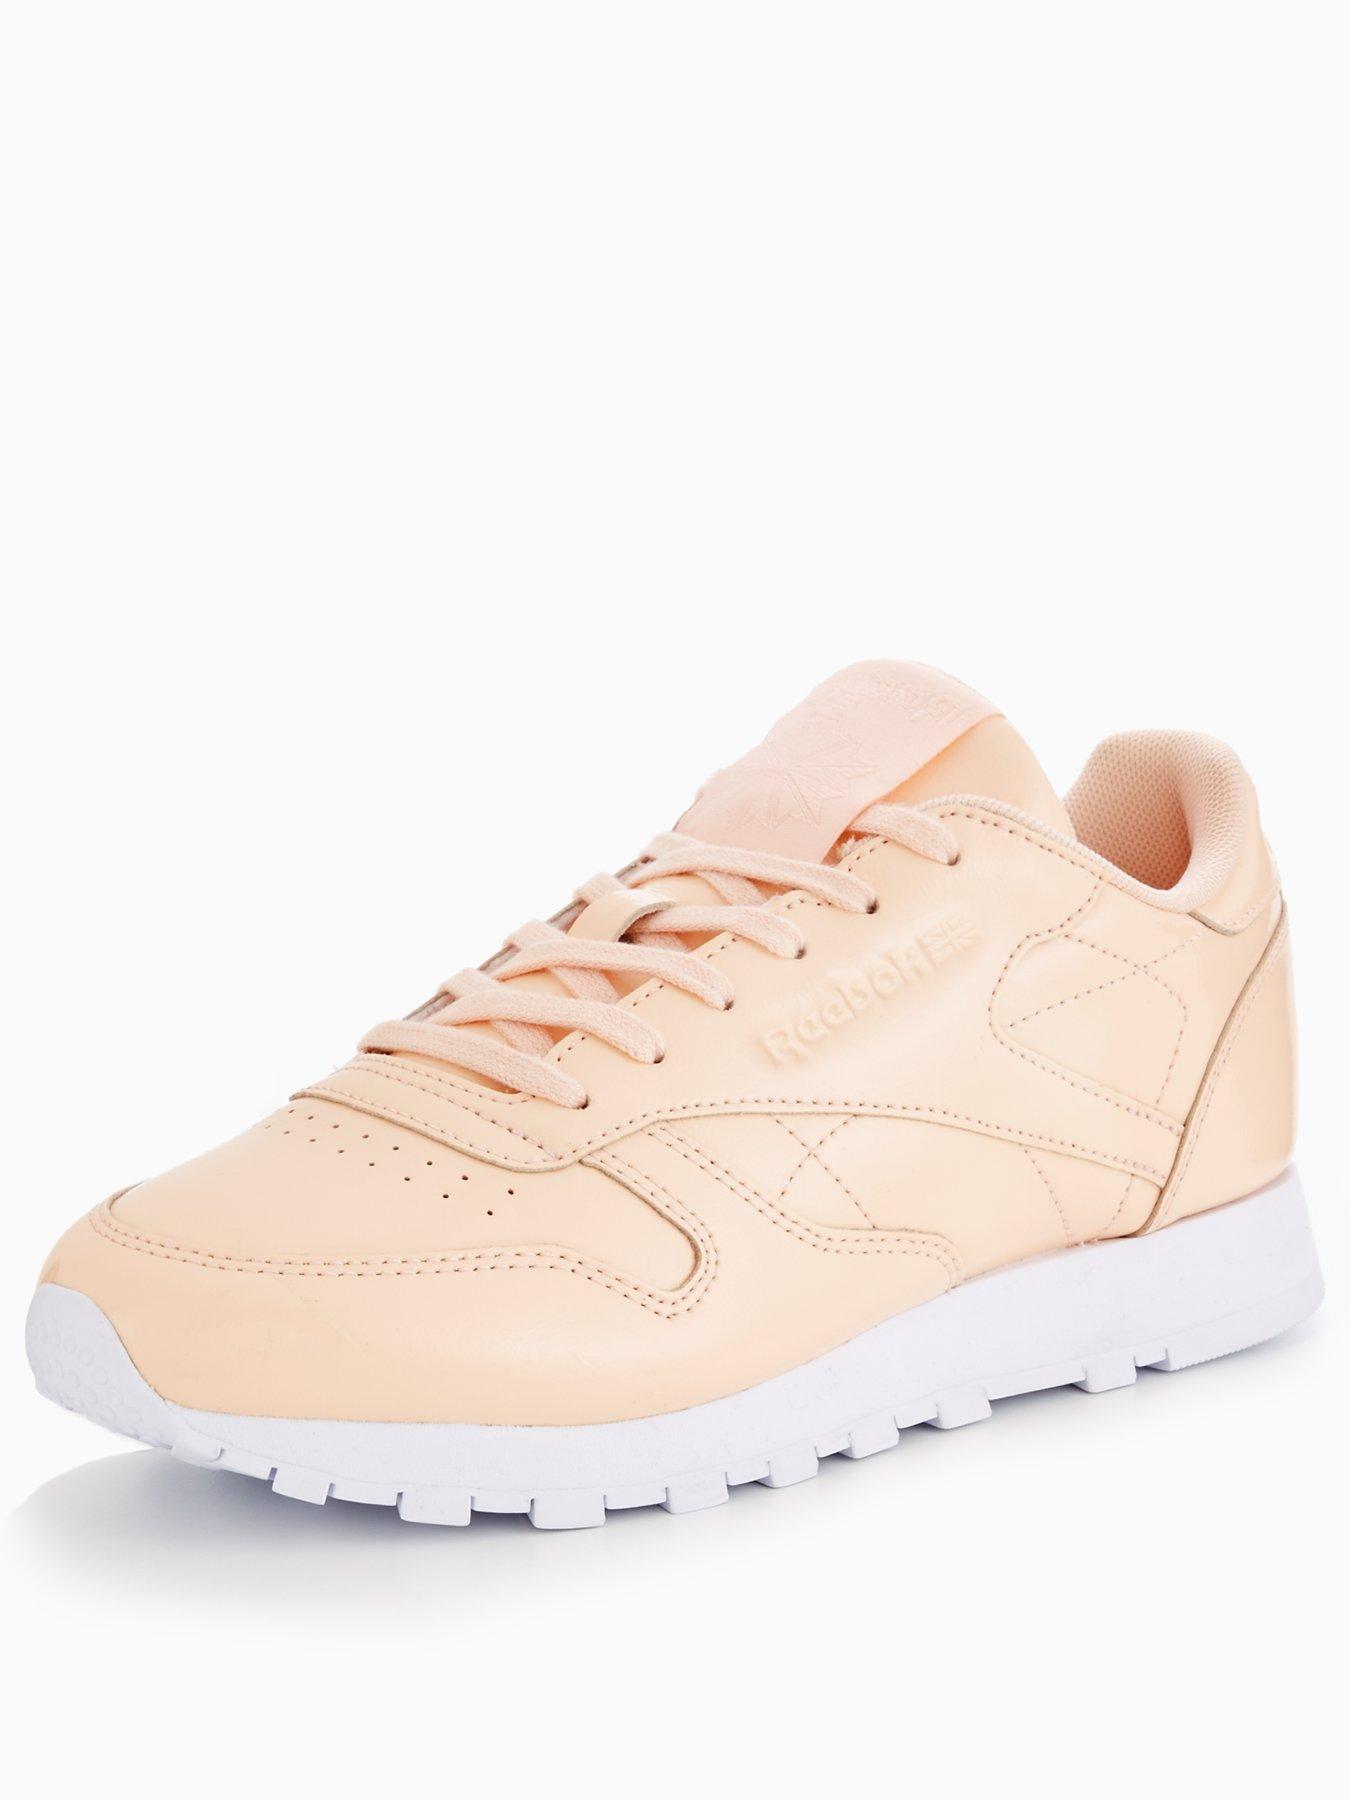 Reebok Classic Leather Patent - Pink